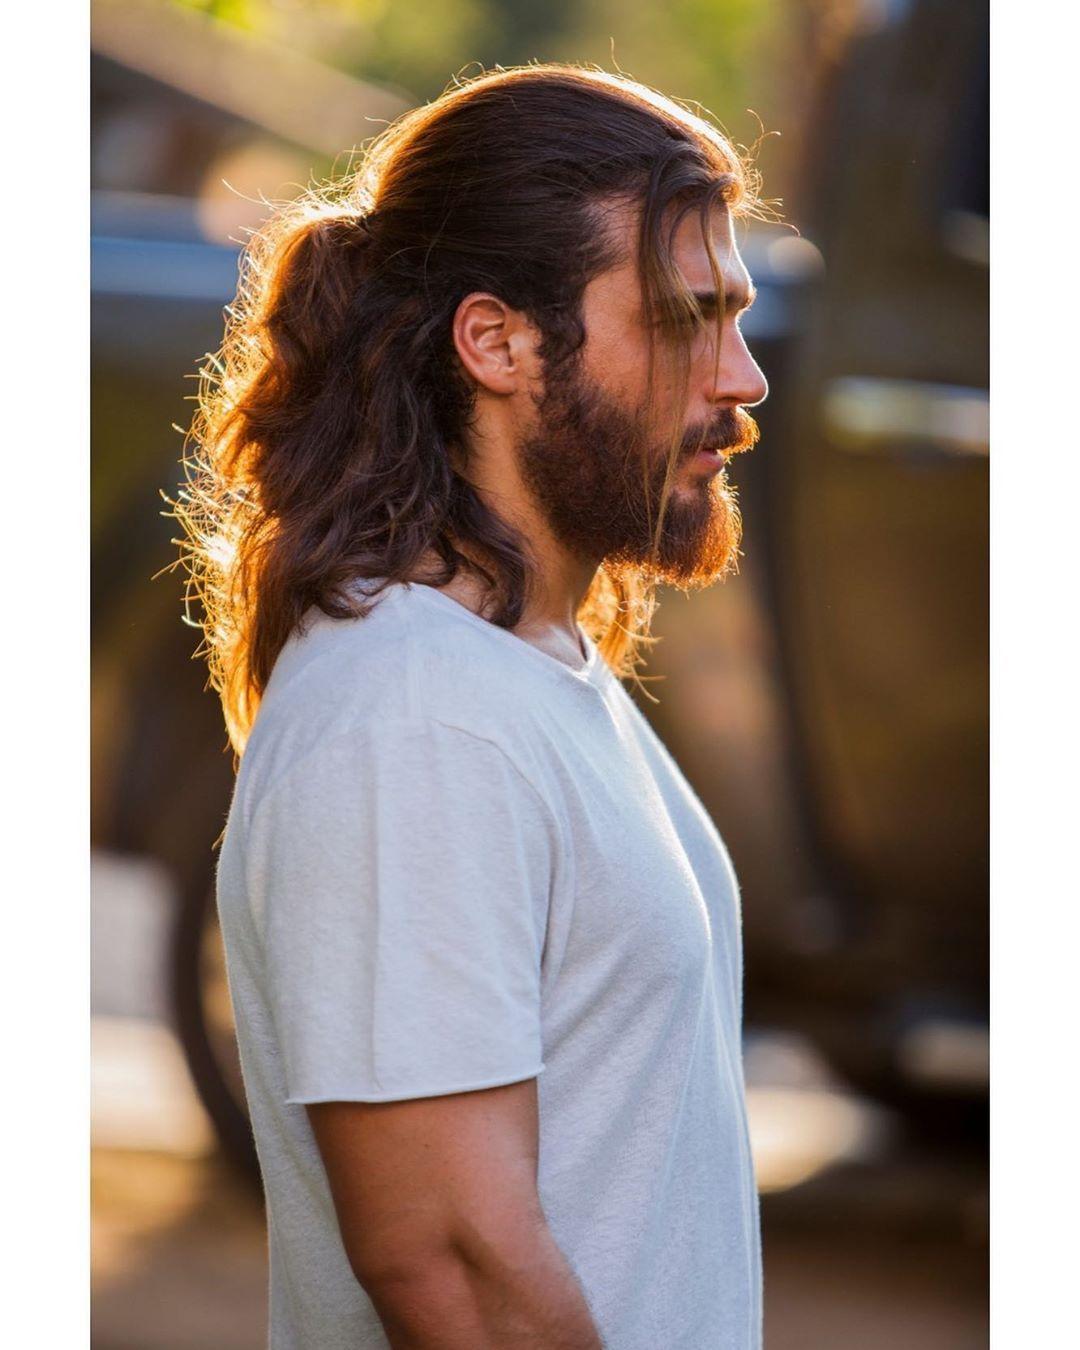 Photo Mortezaatabaki Trending Hairstyles For Men Long Hair Styles Long Hair Styles Men